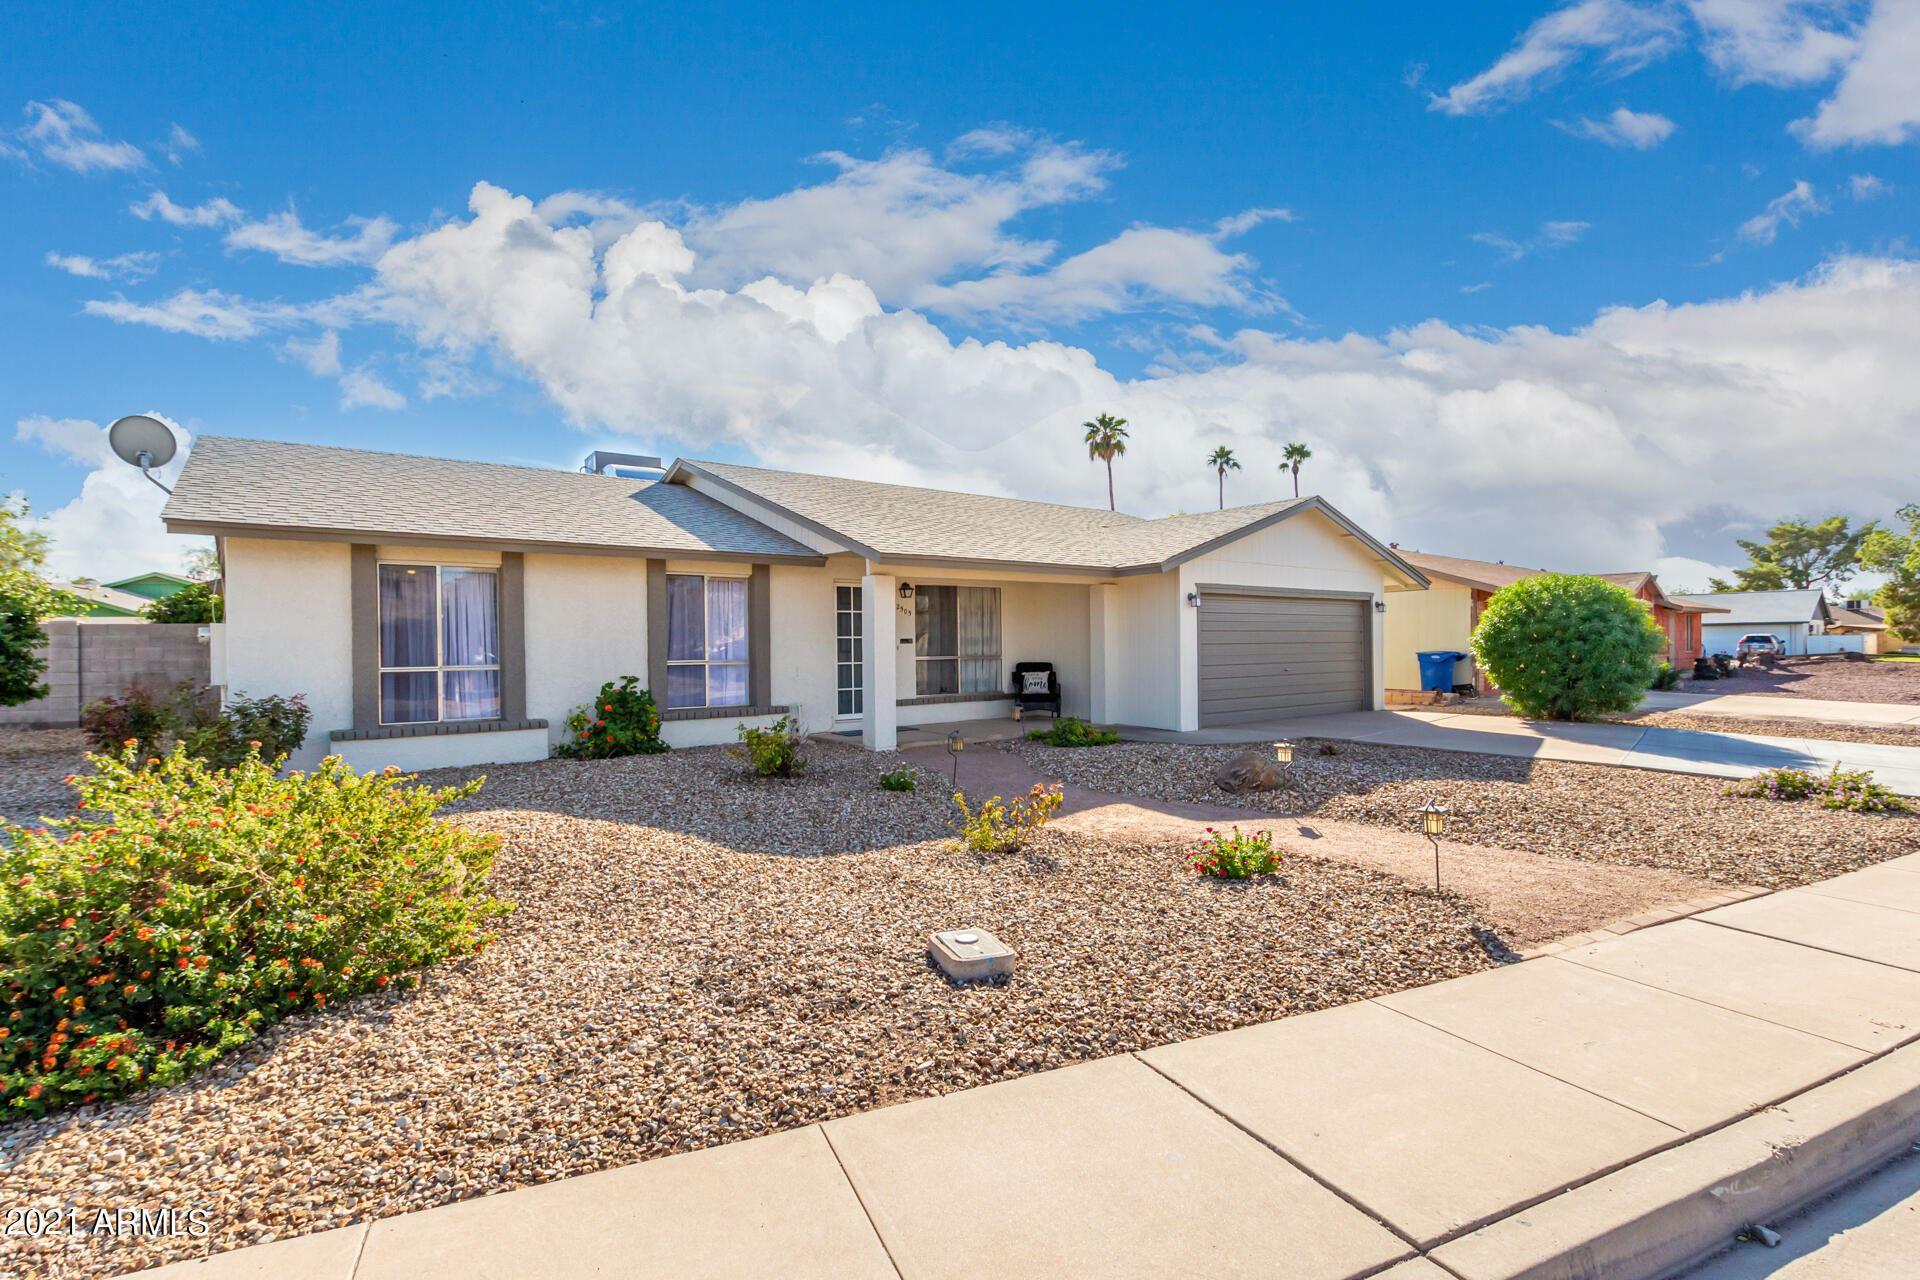 Photo of 2505 E COMMONWEALTH Circle, Chandler, AZ 85225 (MLS # 6311051)